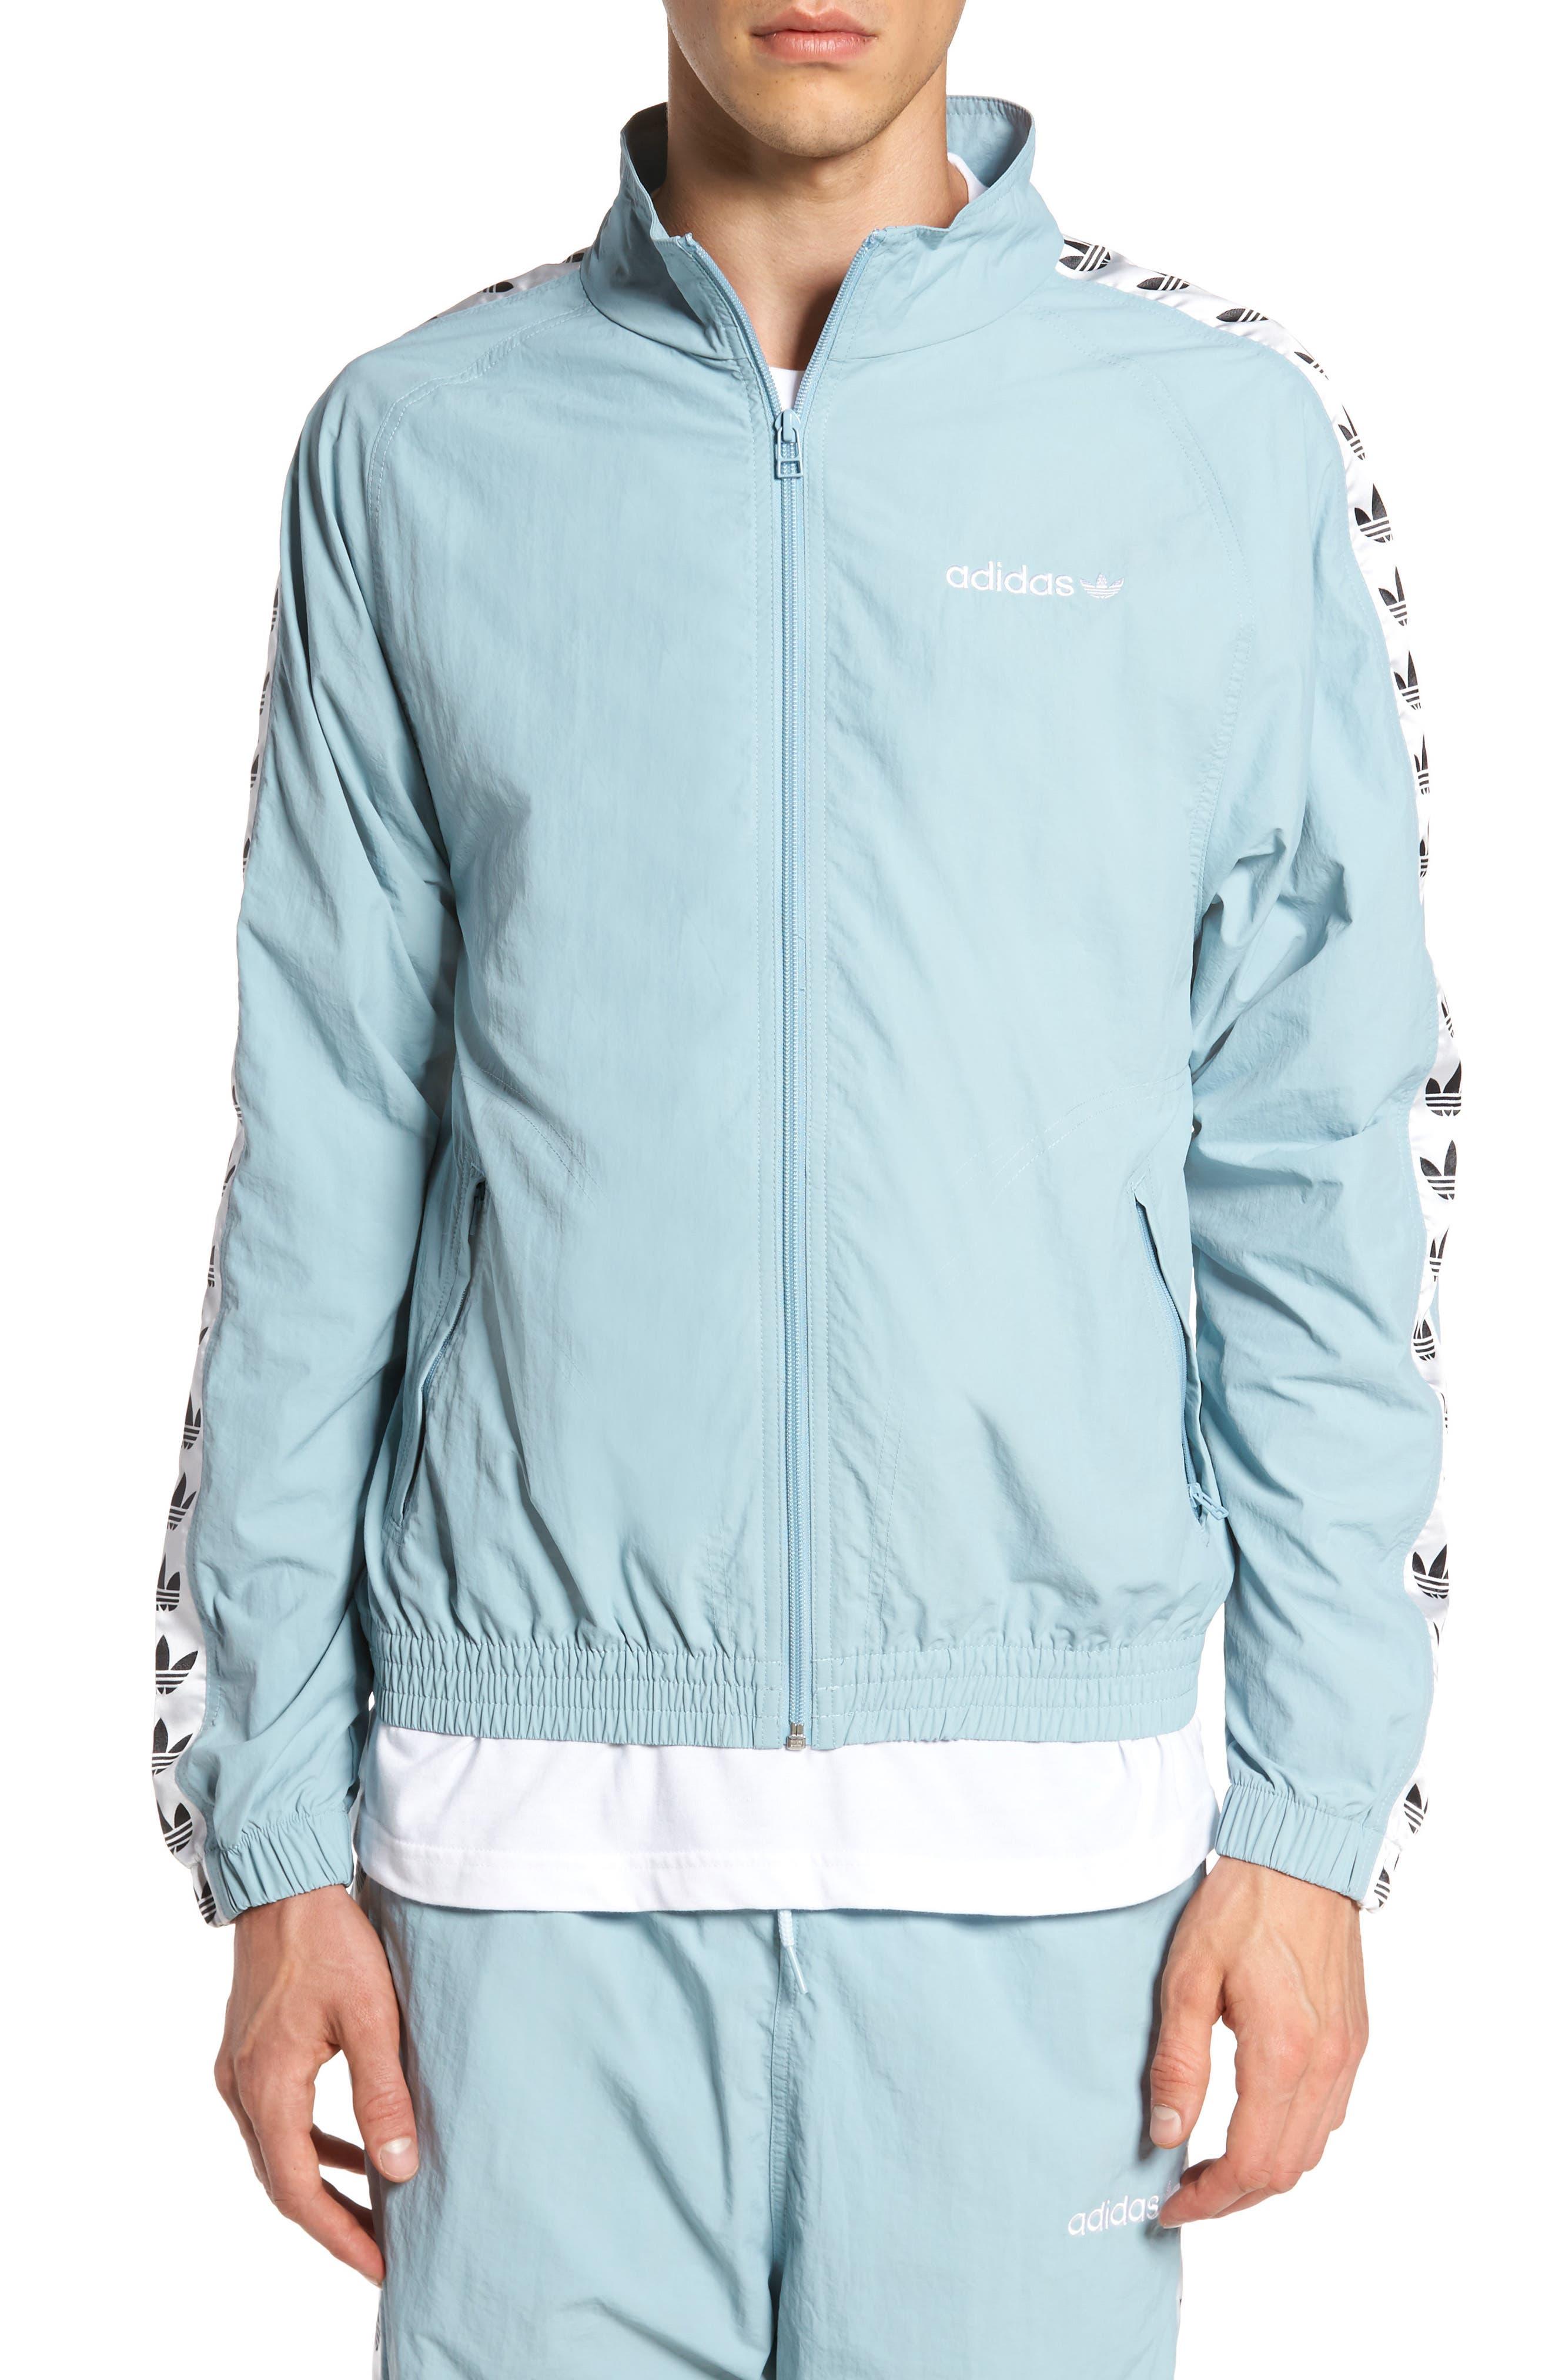 adidas Originals TNT Wind Jacket